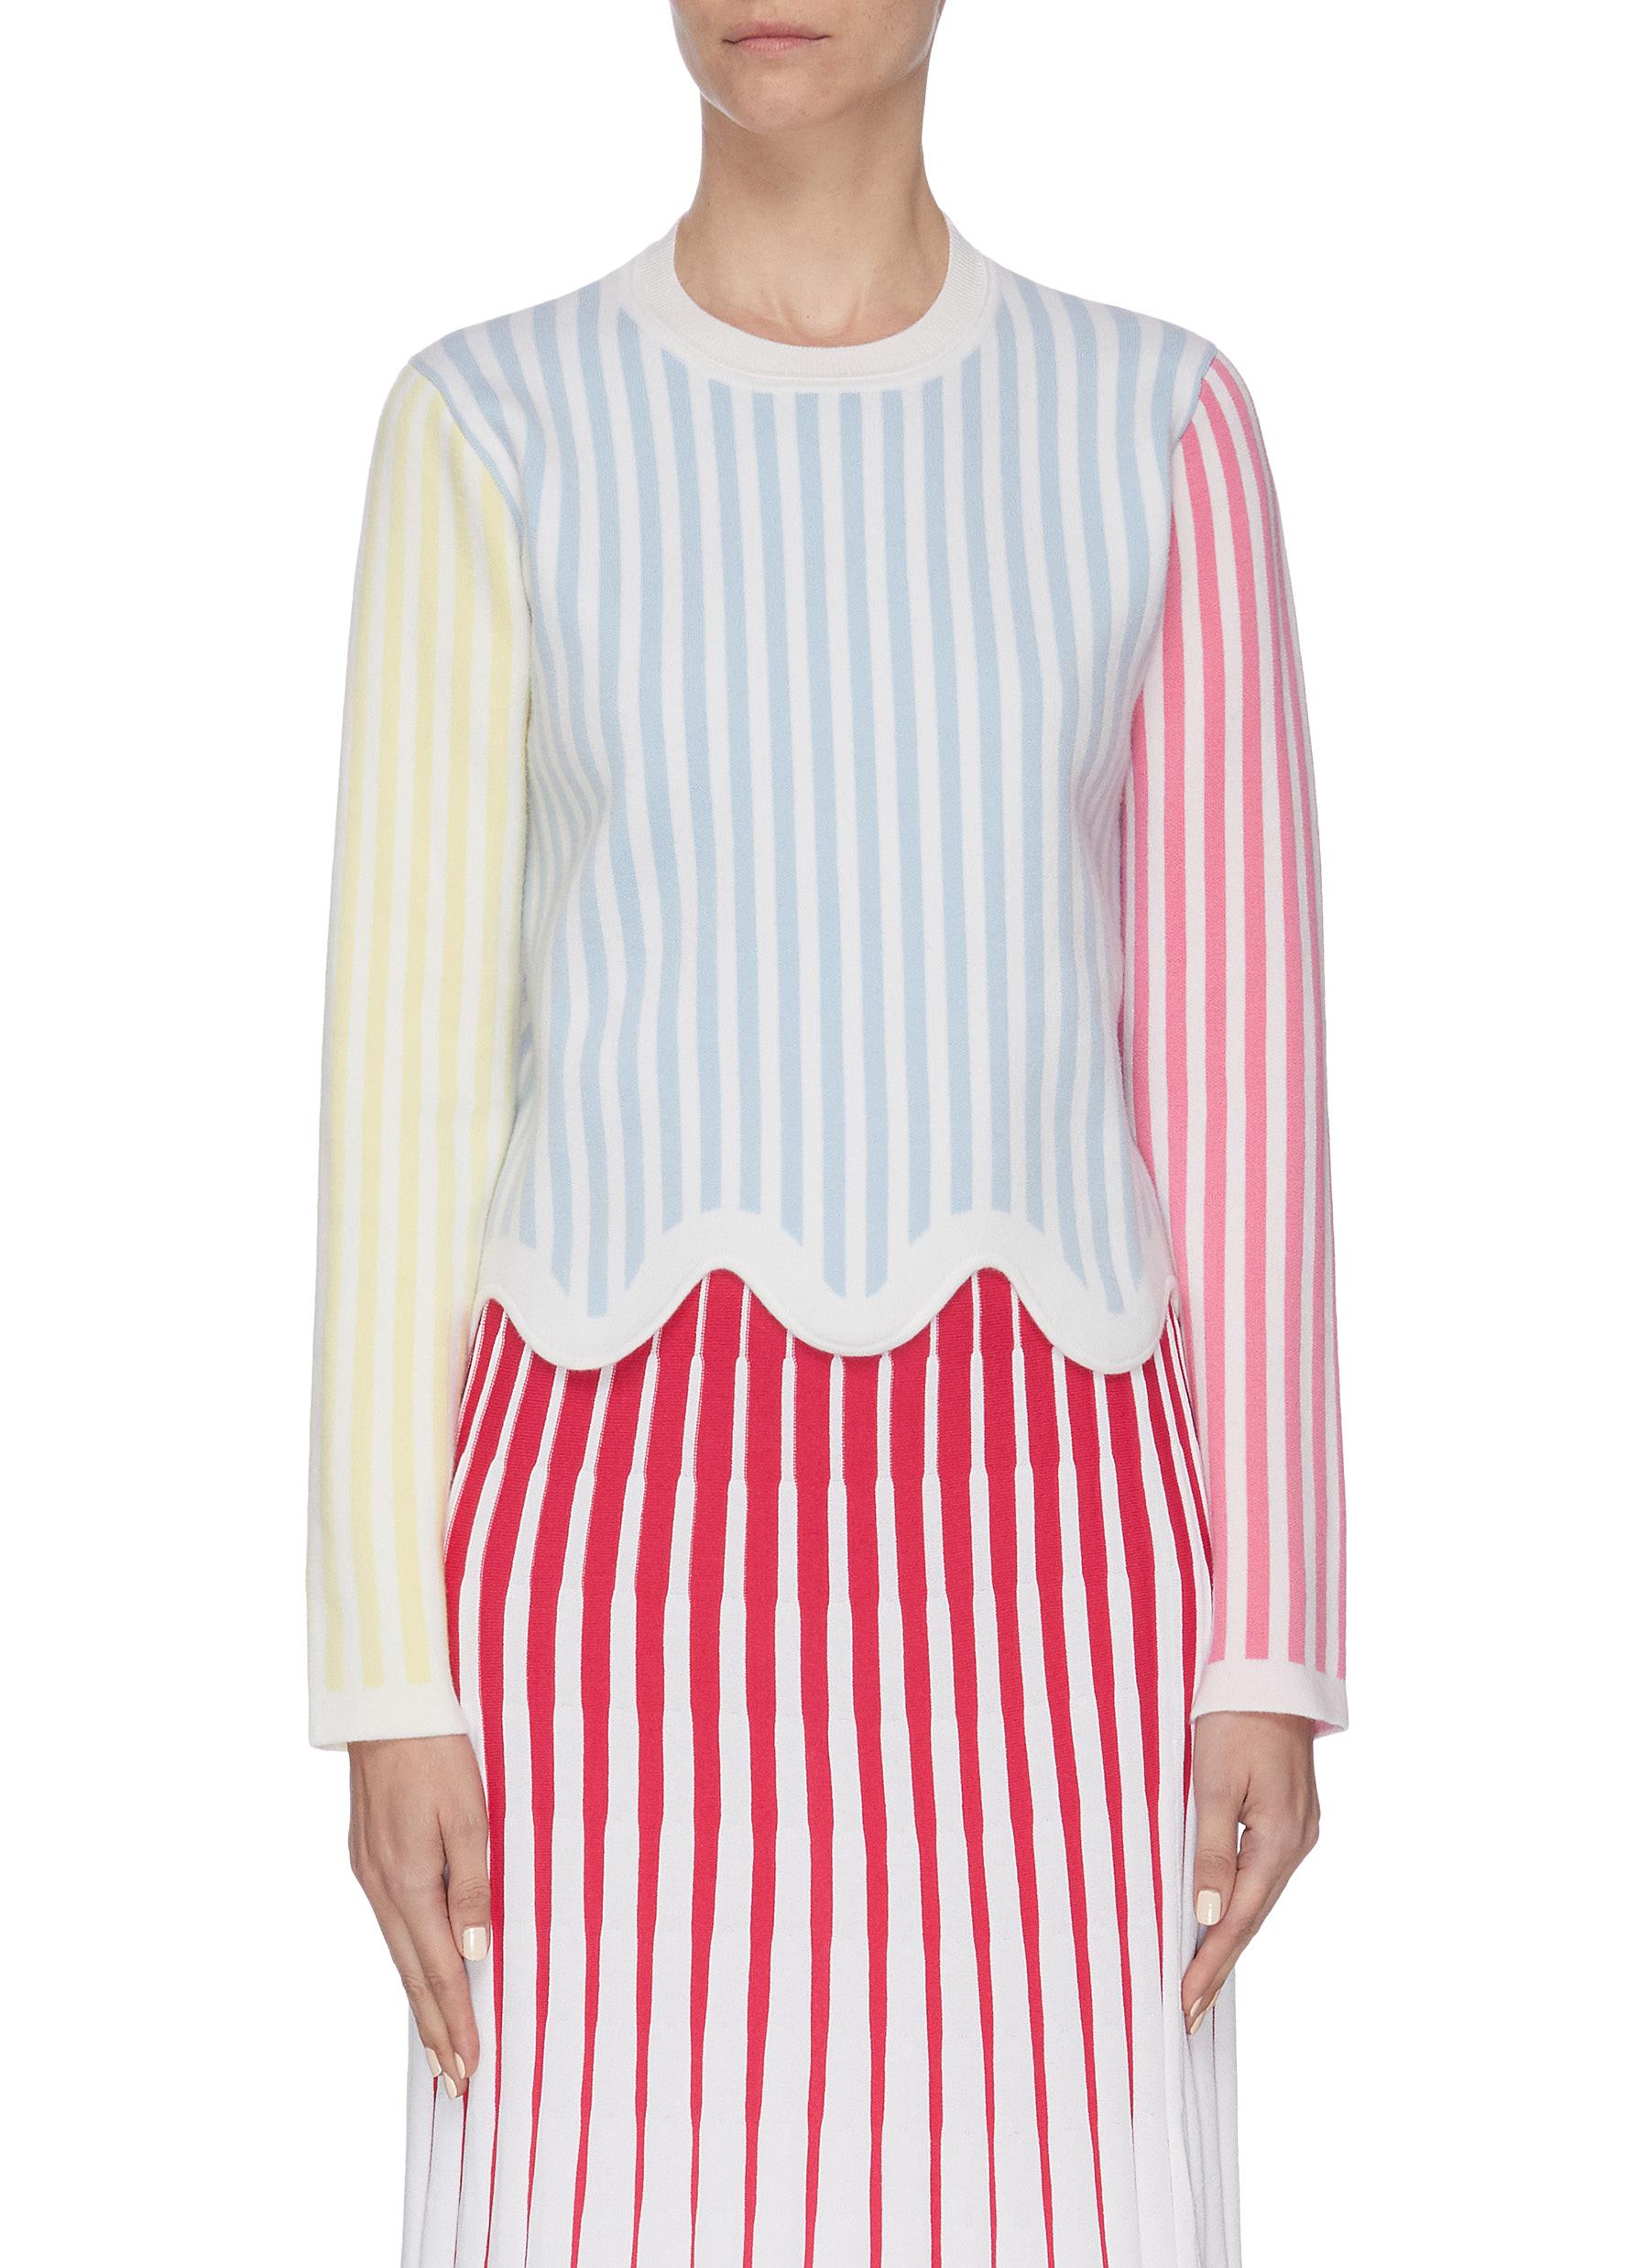 Buy Ph5 Knitwear Colourblock stripe print wavy hem sweatshirt